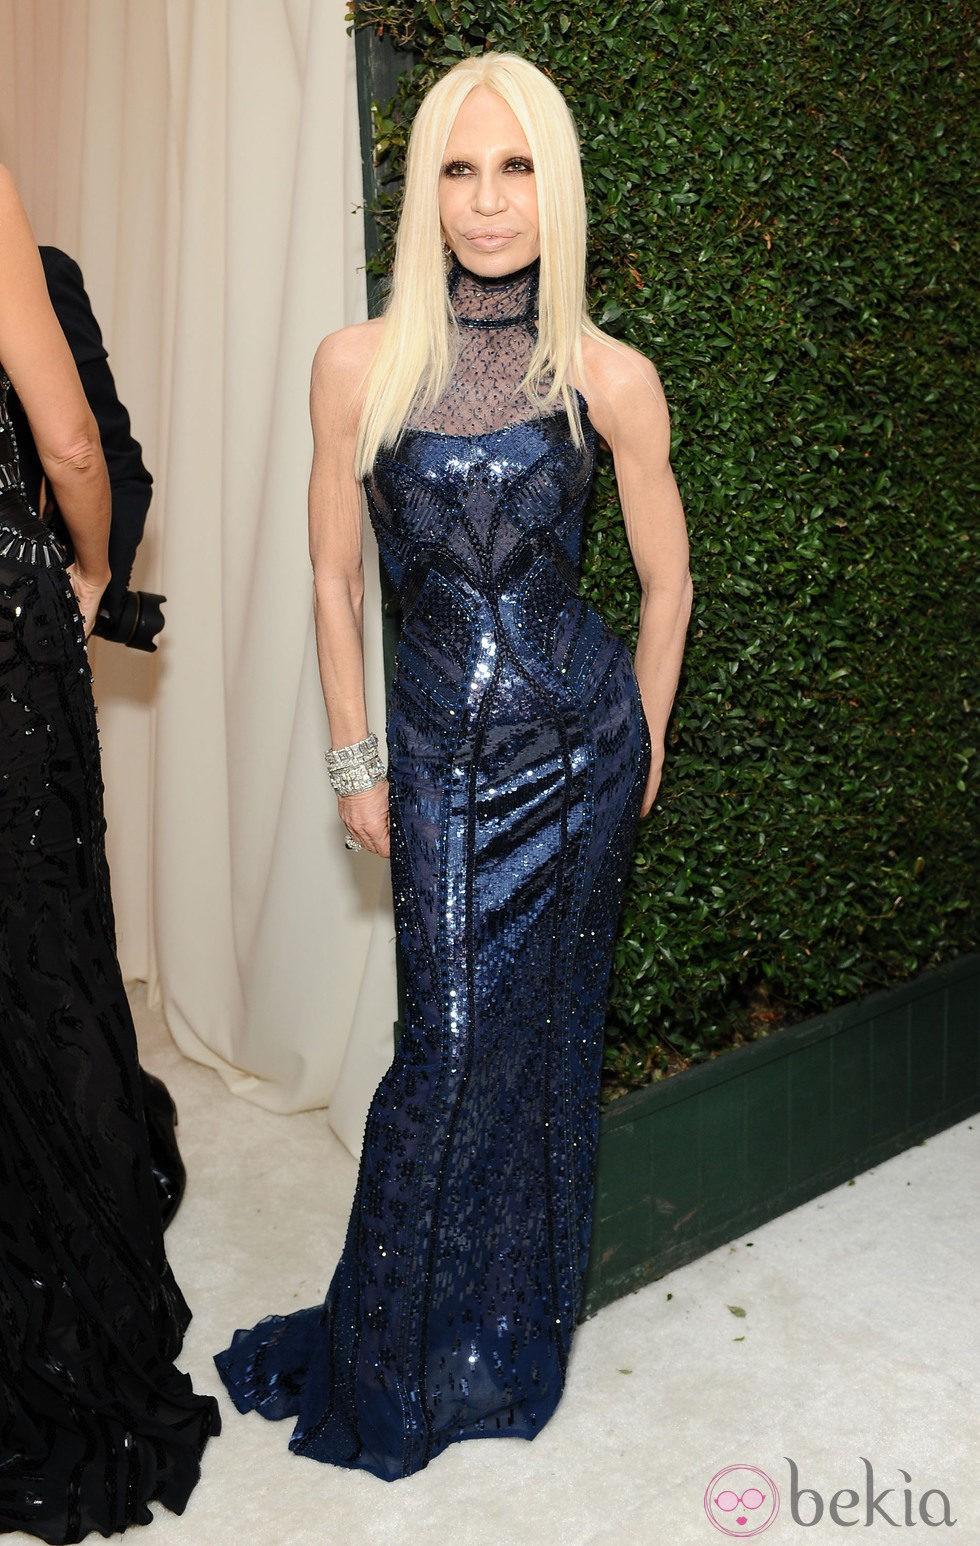 Donatella Versace en la fiesta post Oscar 2014 organizada por Elton John